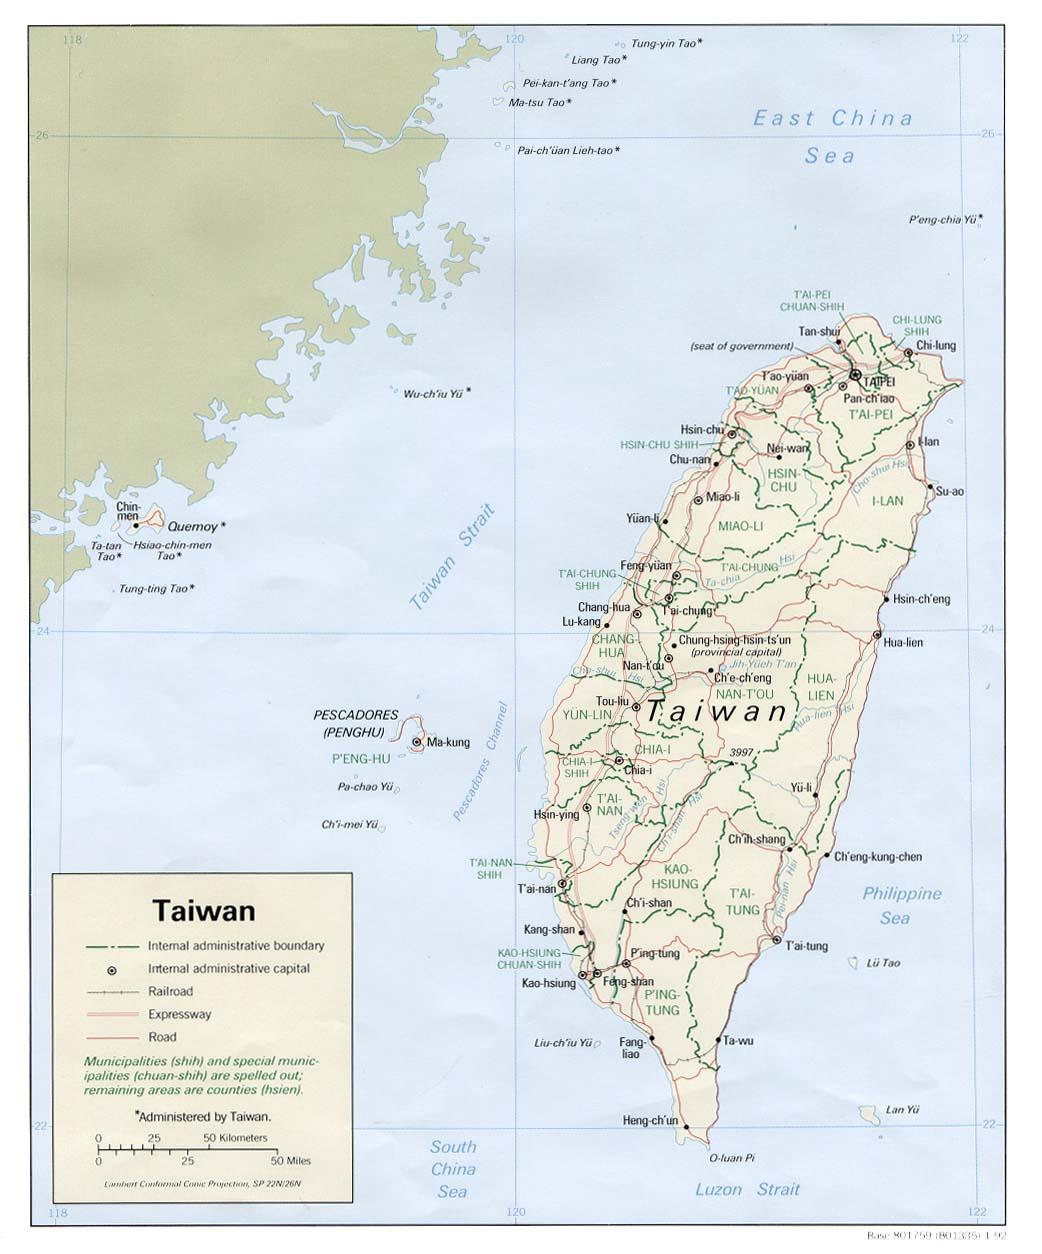 WHKMLA : Historical Atlas, Taiwan Page